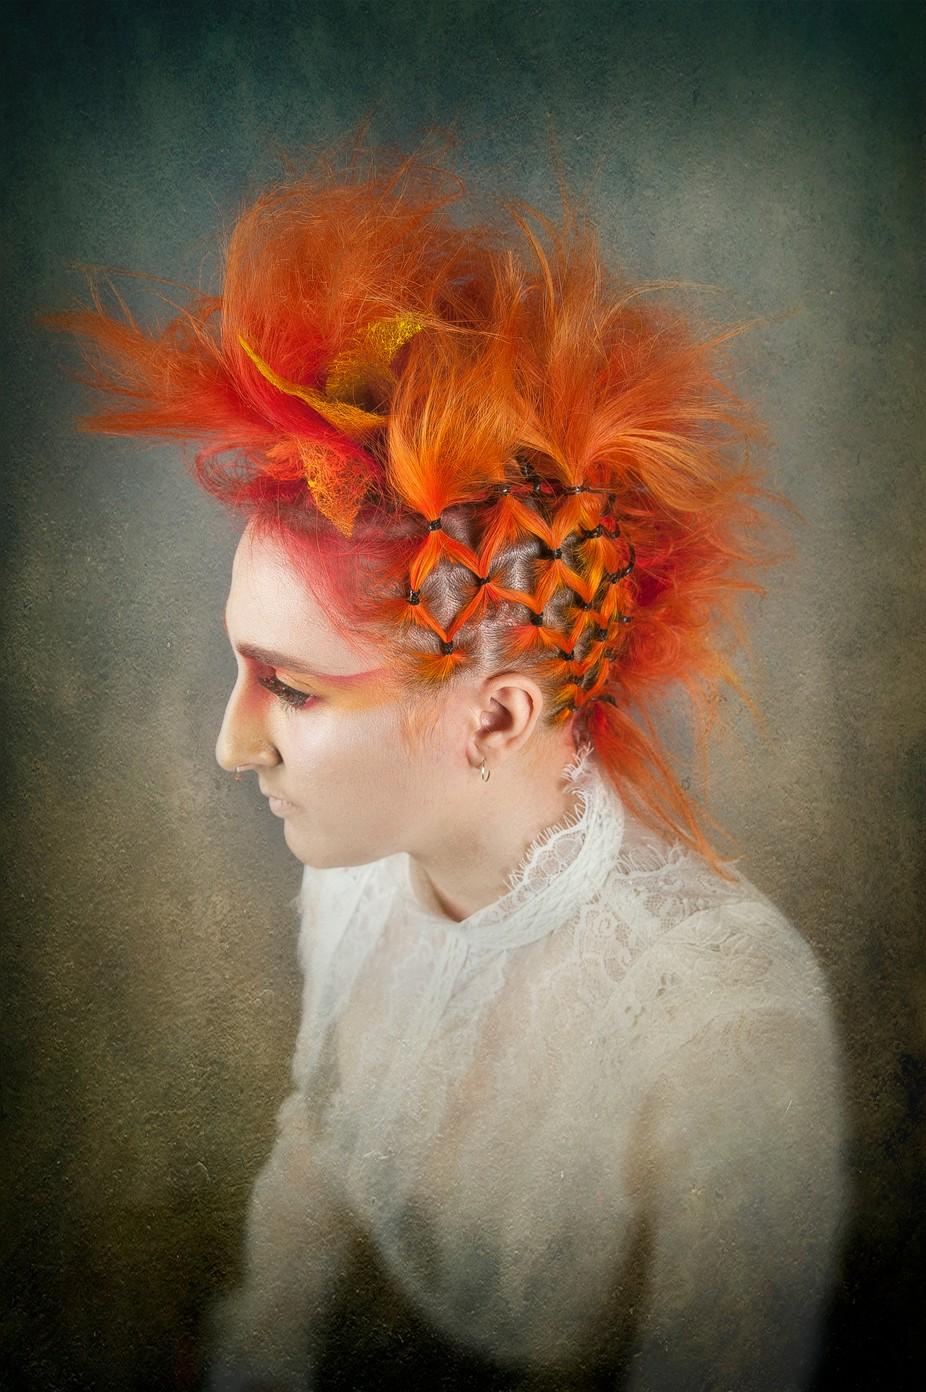 Orange by ShiftingLightPhotography - Orange Tones Photo Contest